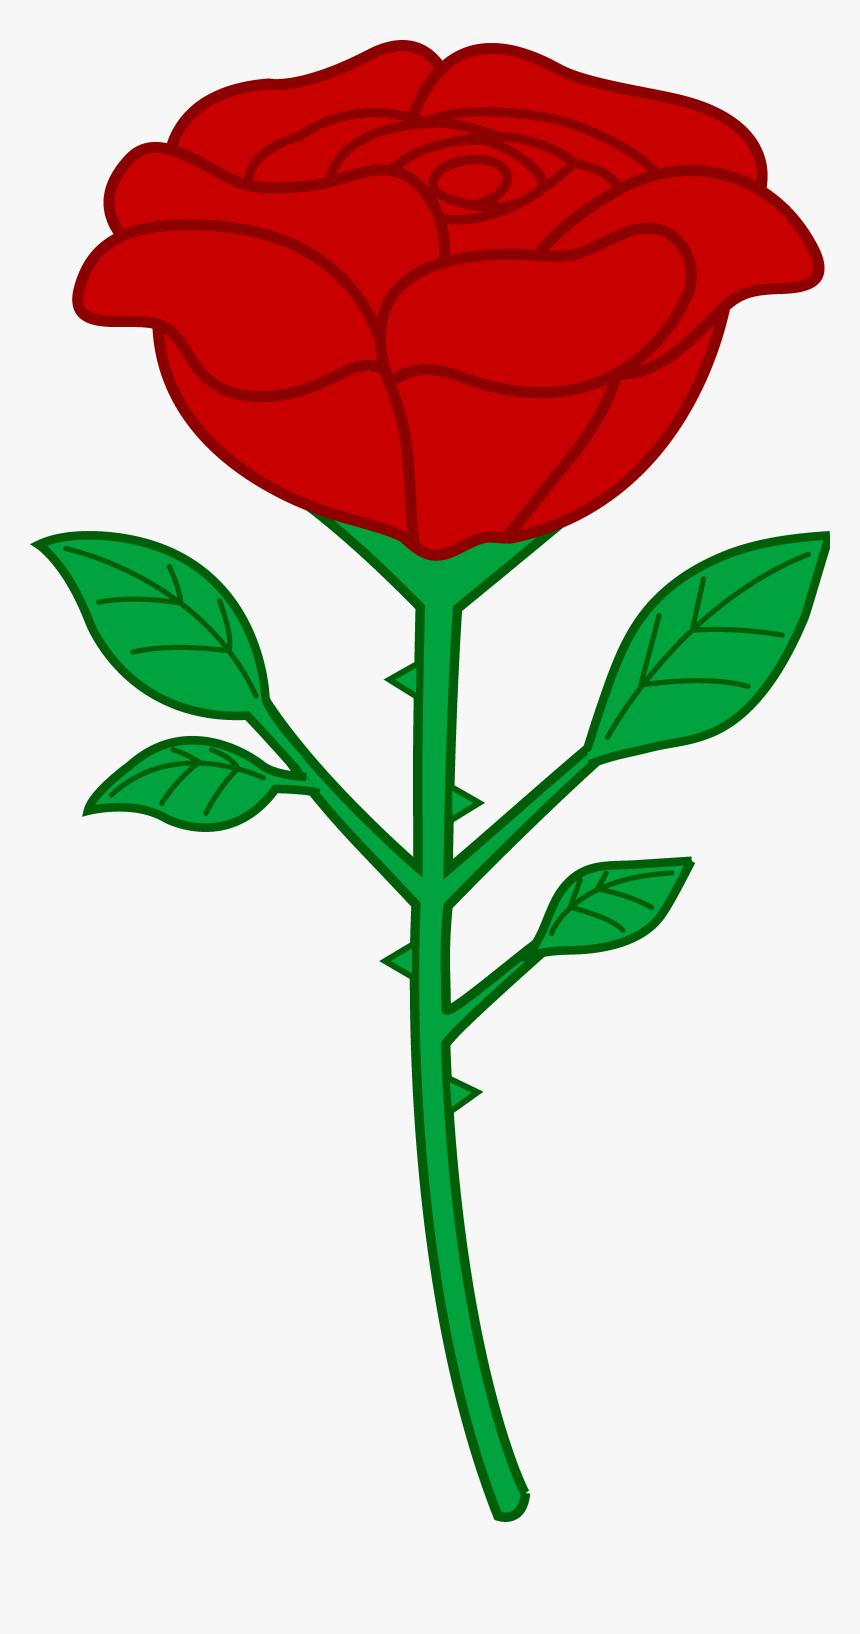 Free Red Rose Clipart Download Clip Art On Png Rose Clipart Transparent Png Transparent Png Image Pngitem